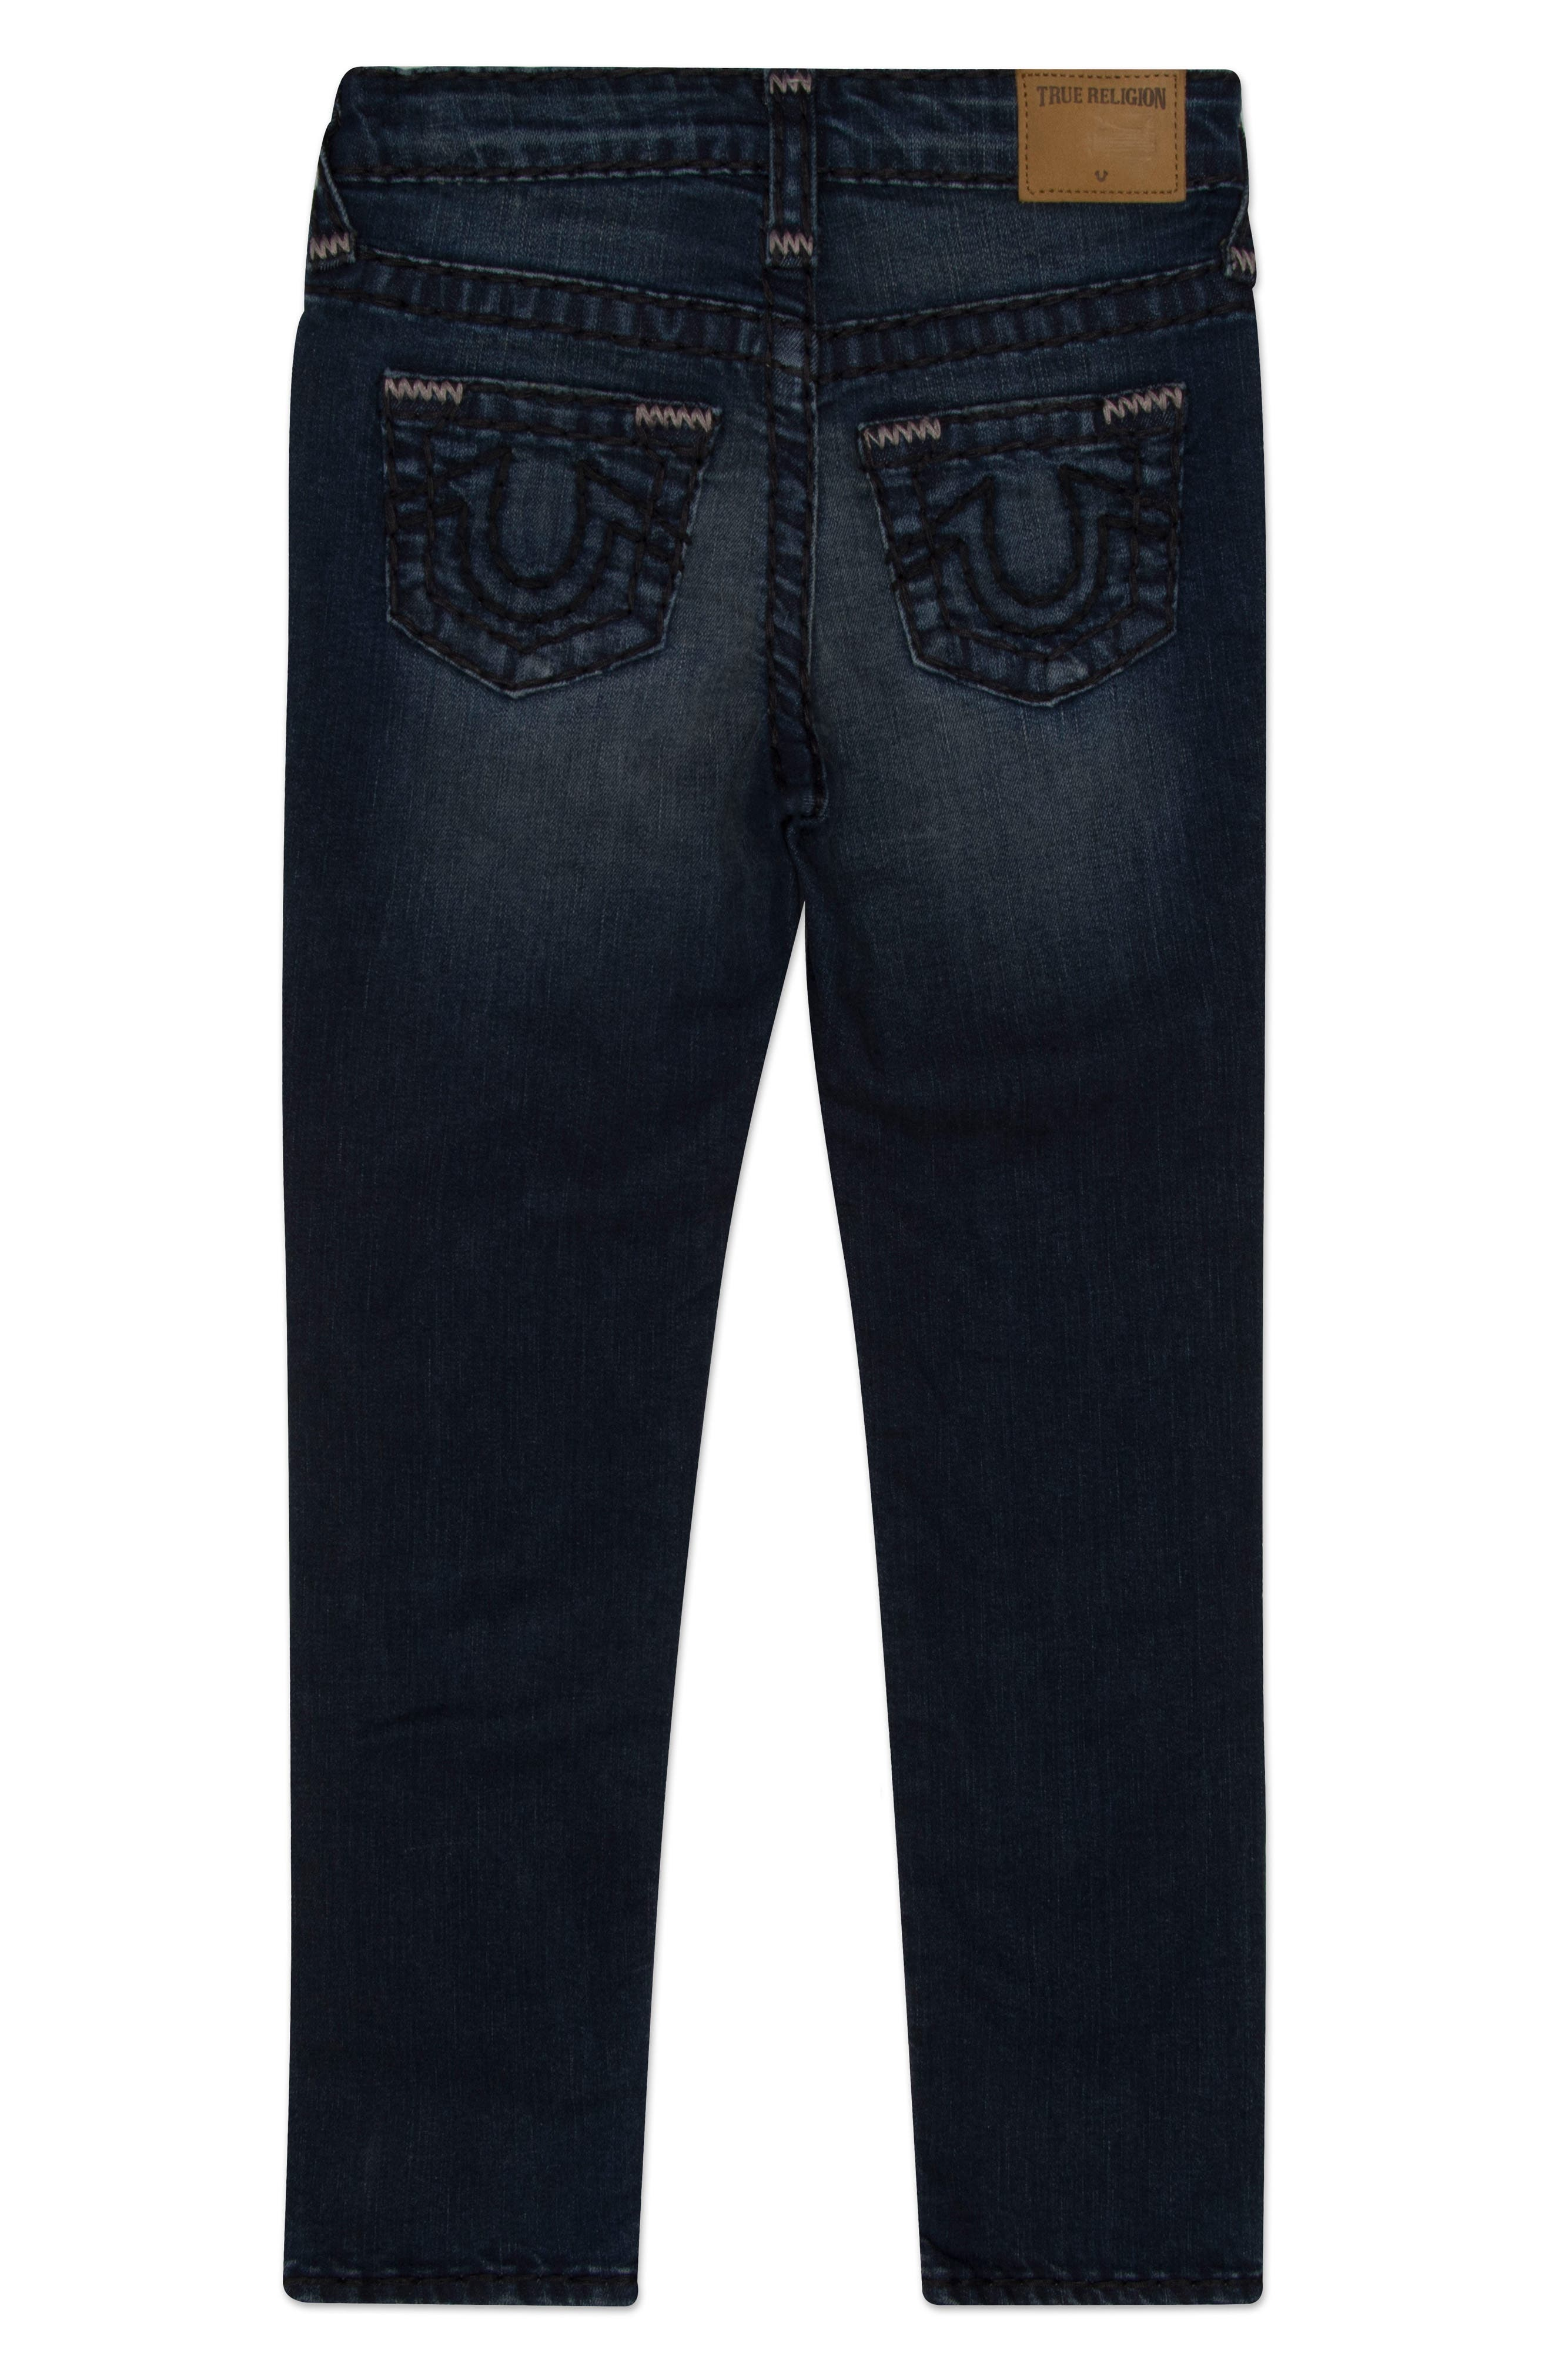 Alternate Image 2  - True Religion Brand Jeans Geno Super T Jeans (Toddler Boys, Little Boys & Big Boys)